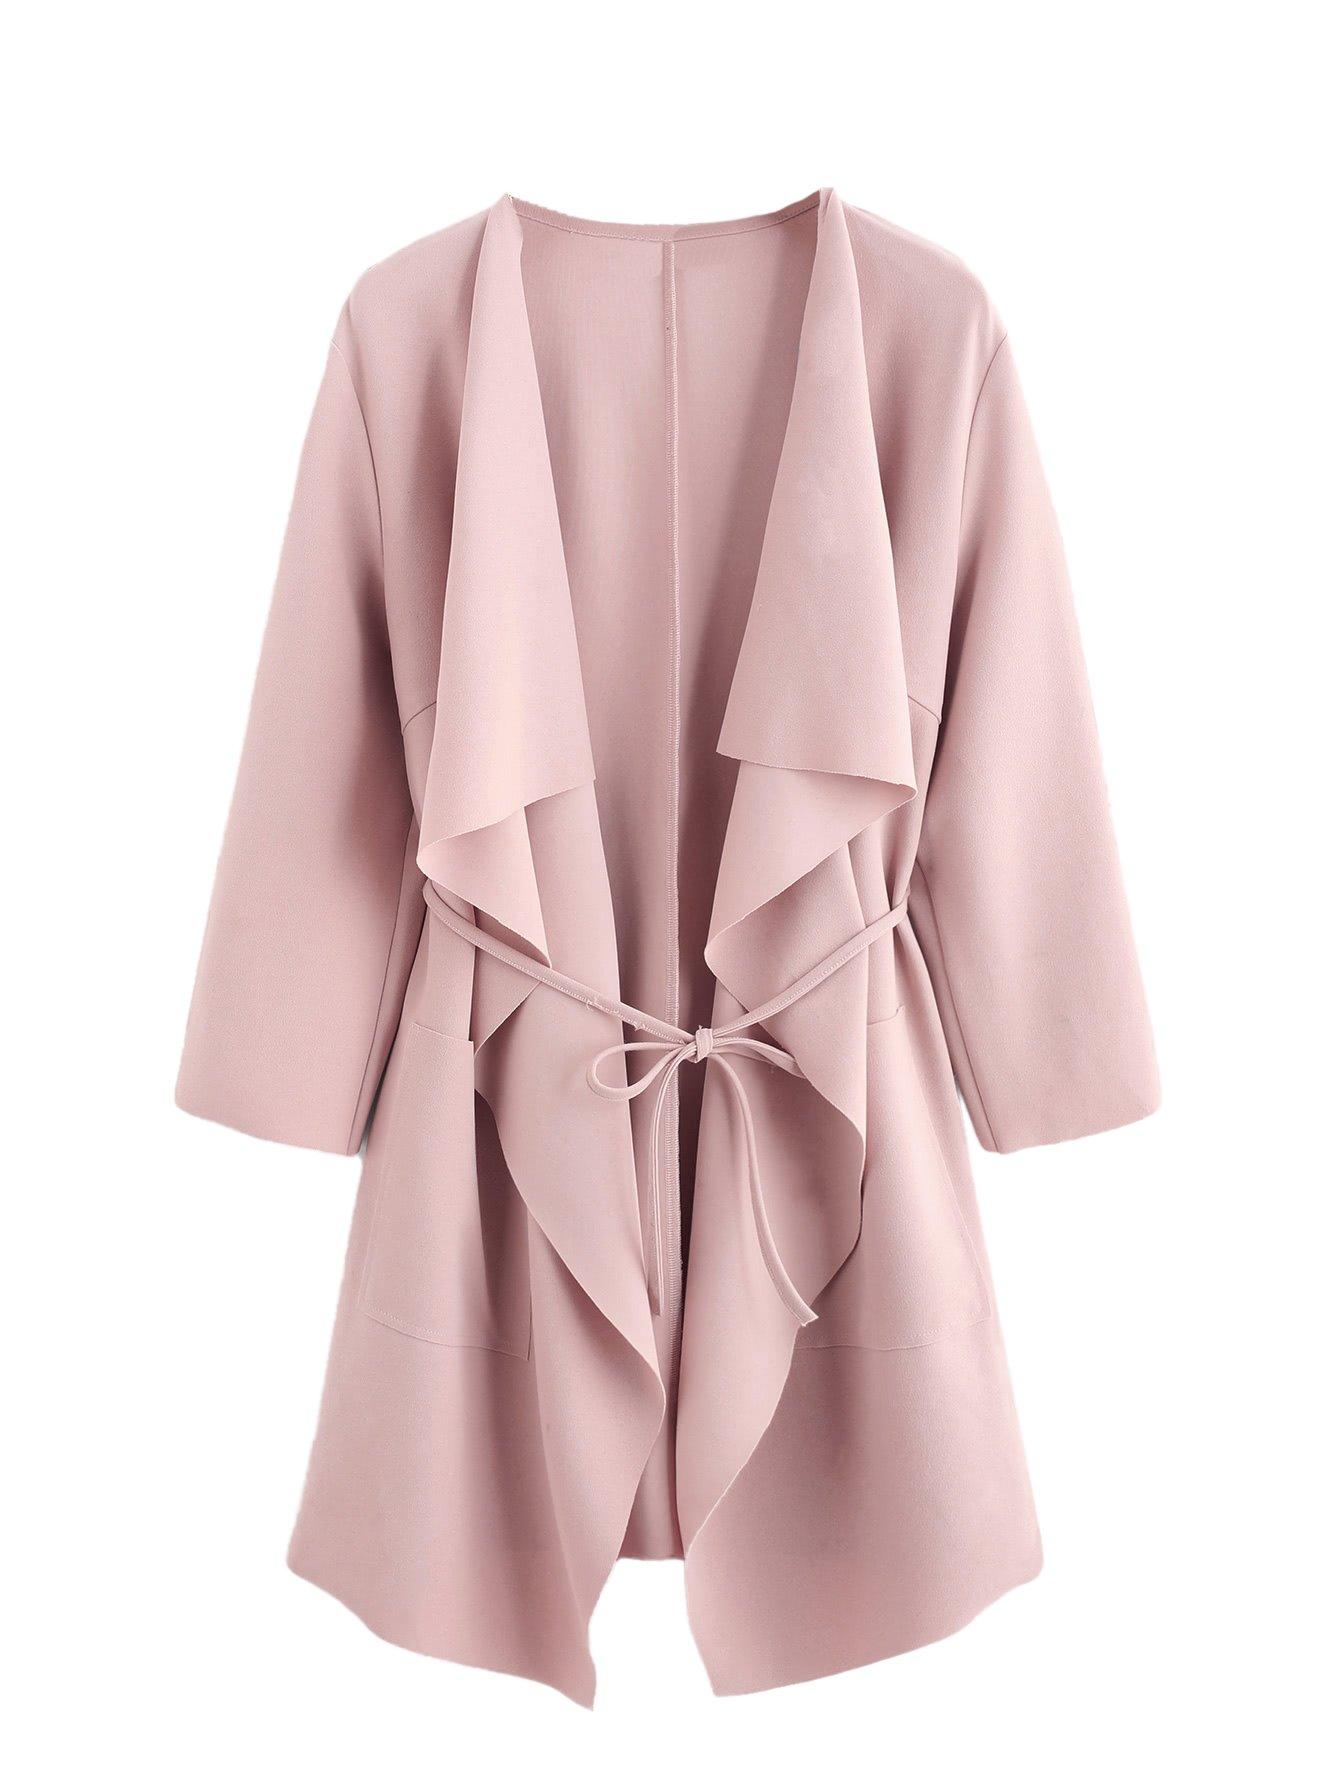 Romwe Women's Raw Cut Hem Waterfall Collar Long Sleeve Wrap Trench Coat Cardigan Pink M